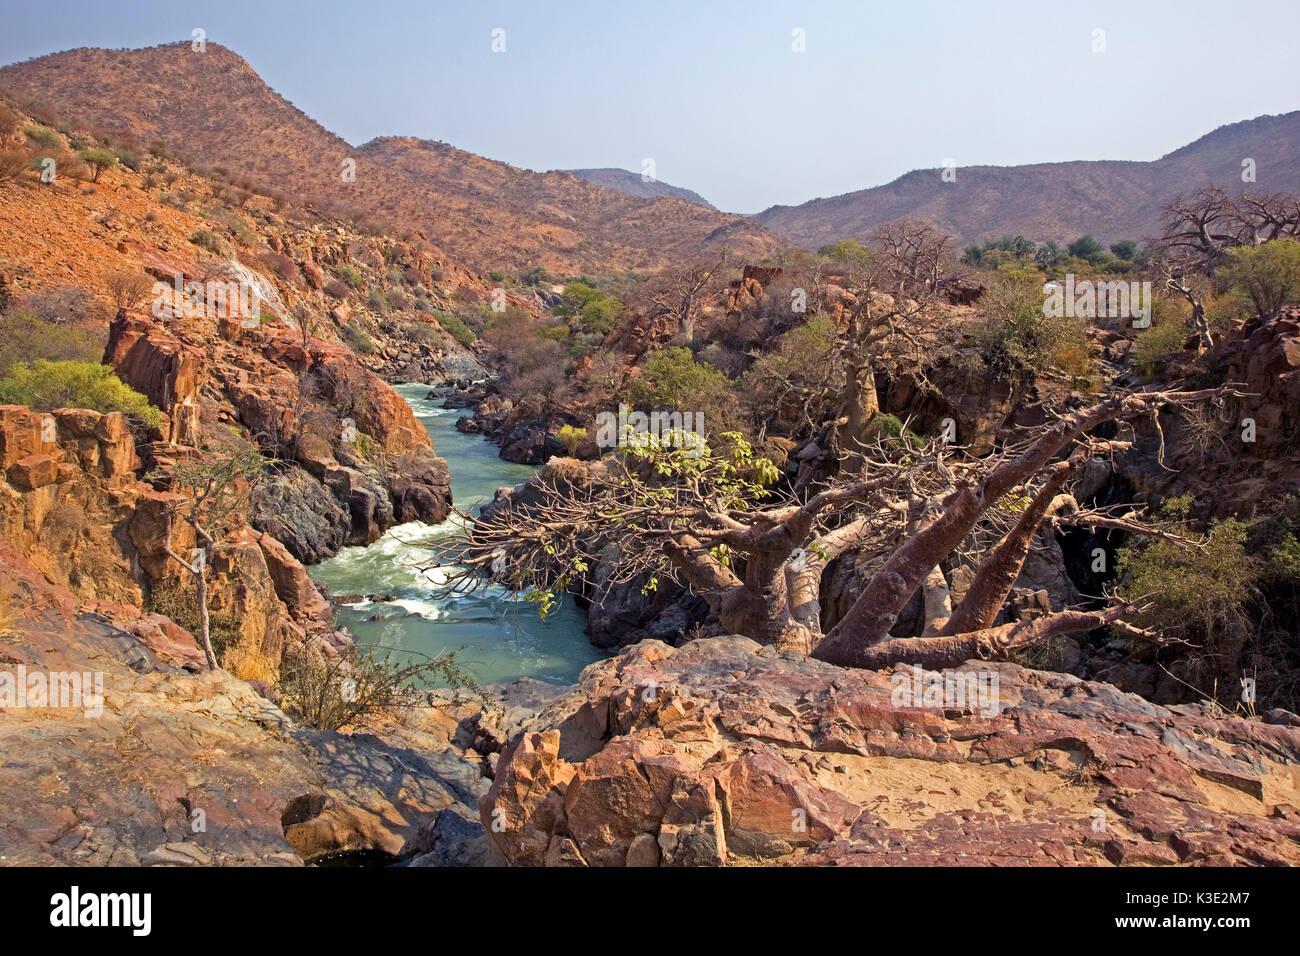 Africa, Namibia, Kunene region, Kaokoveld, Kaokoland, Kunene river, rapids, border area, Angola, - Stock Image